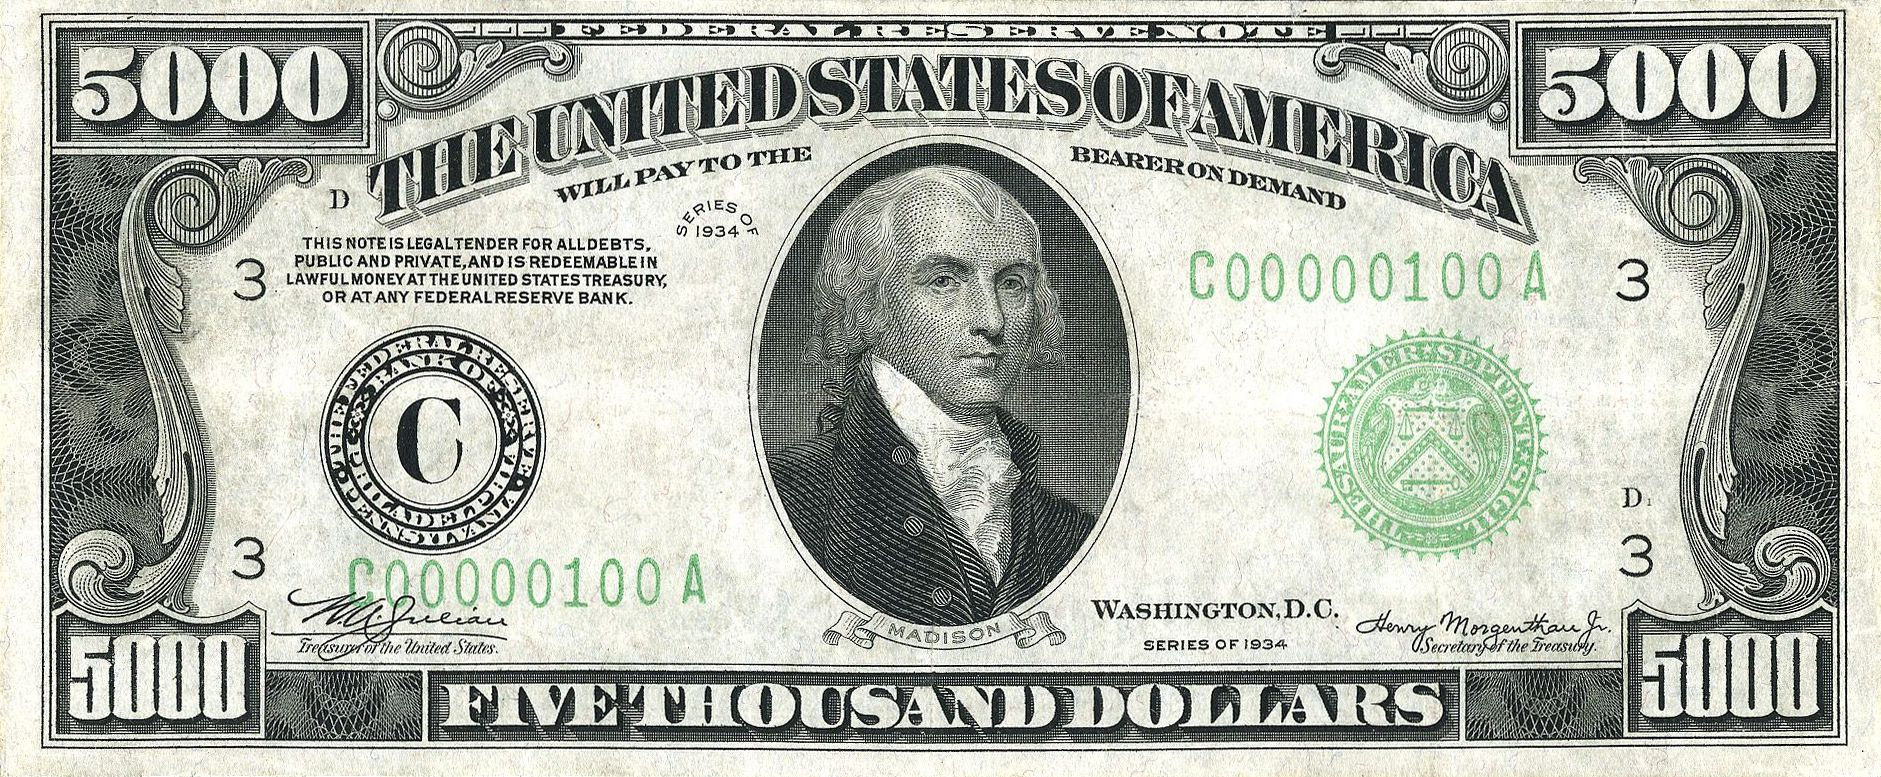 5000 In Savings Thousand Dollar Bill 5000 Dollar Bill Money Notes